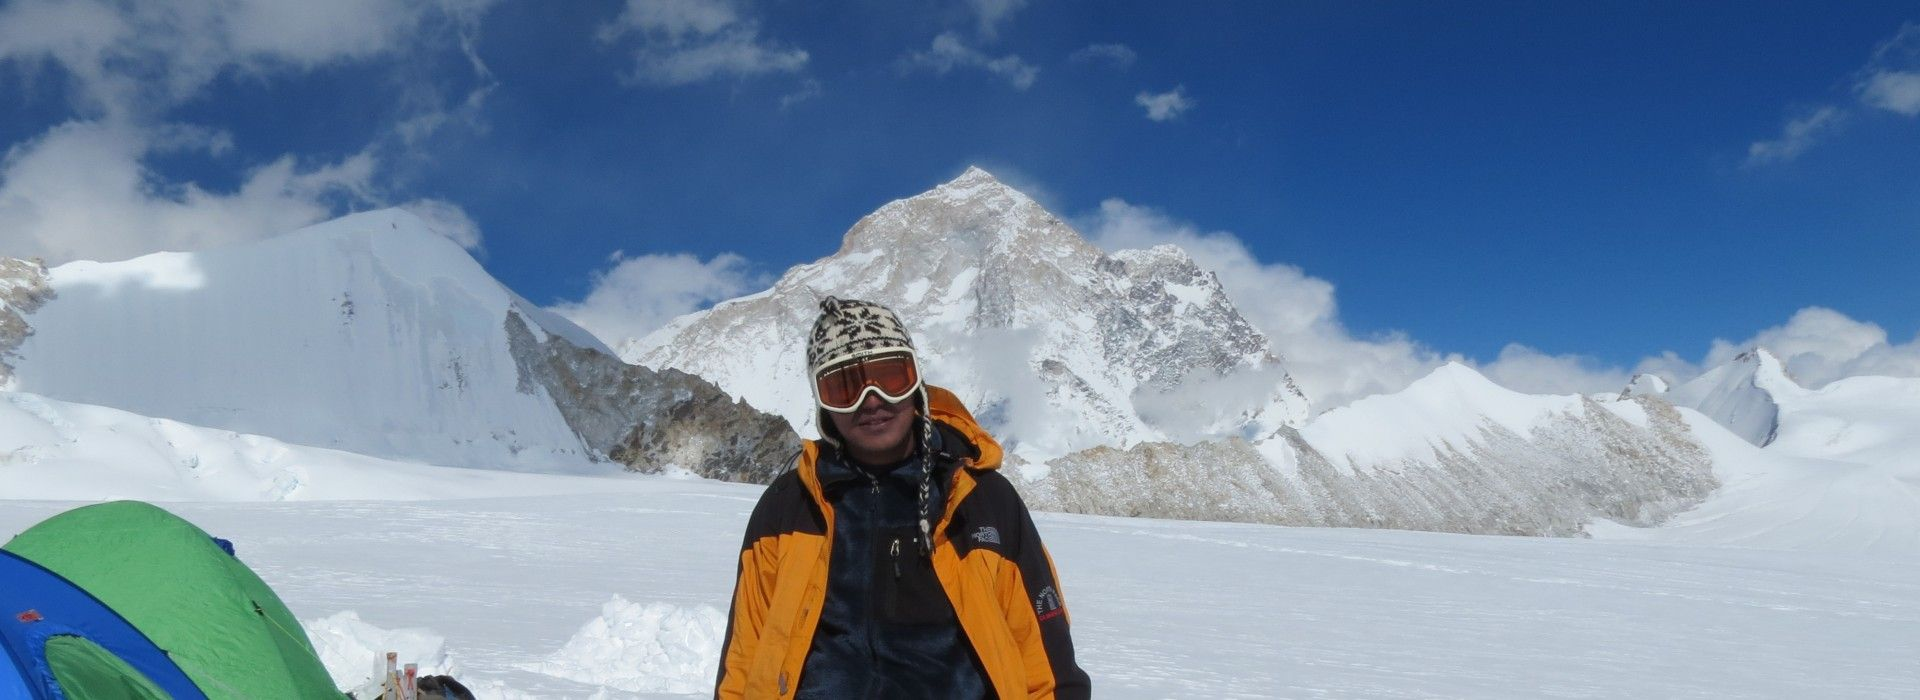 A trekker standing on the Makalu Base Camp Trek, with Mt Makalu in the background